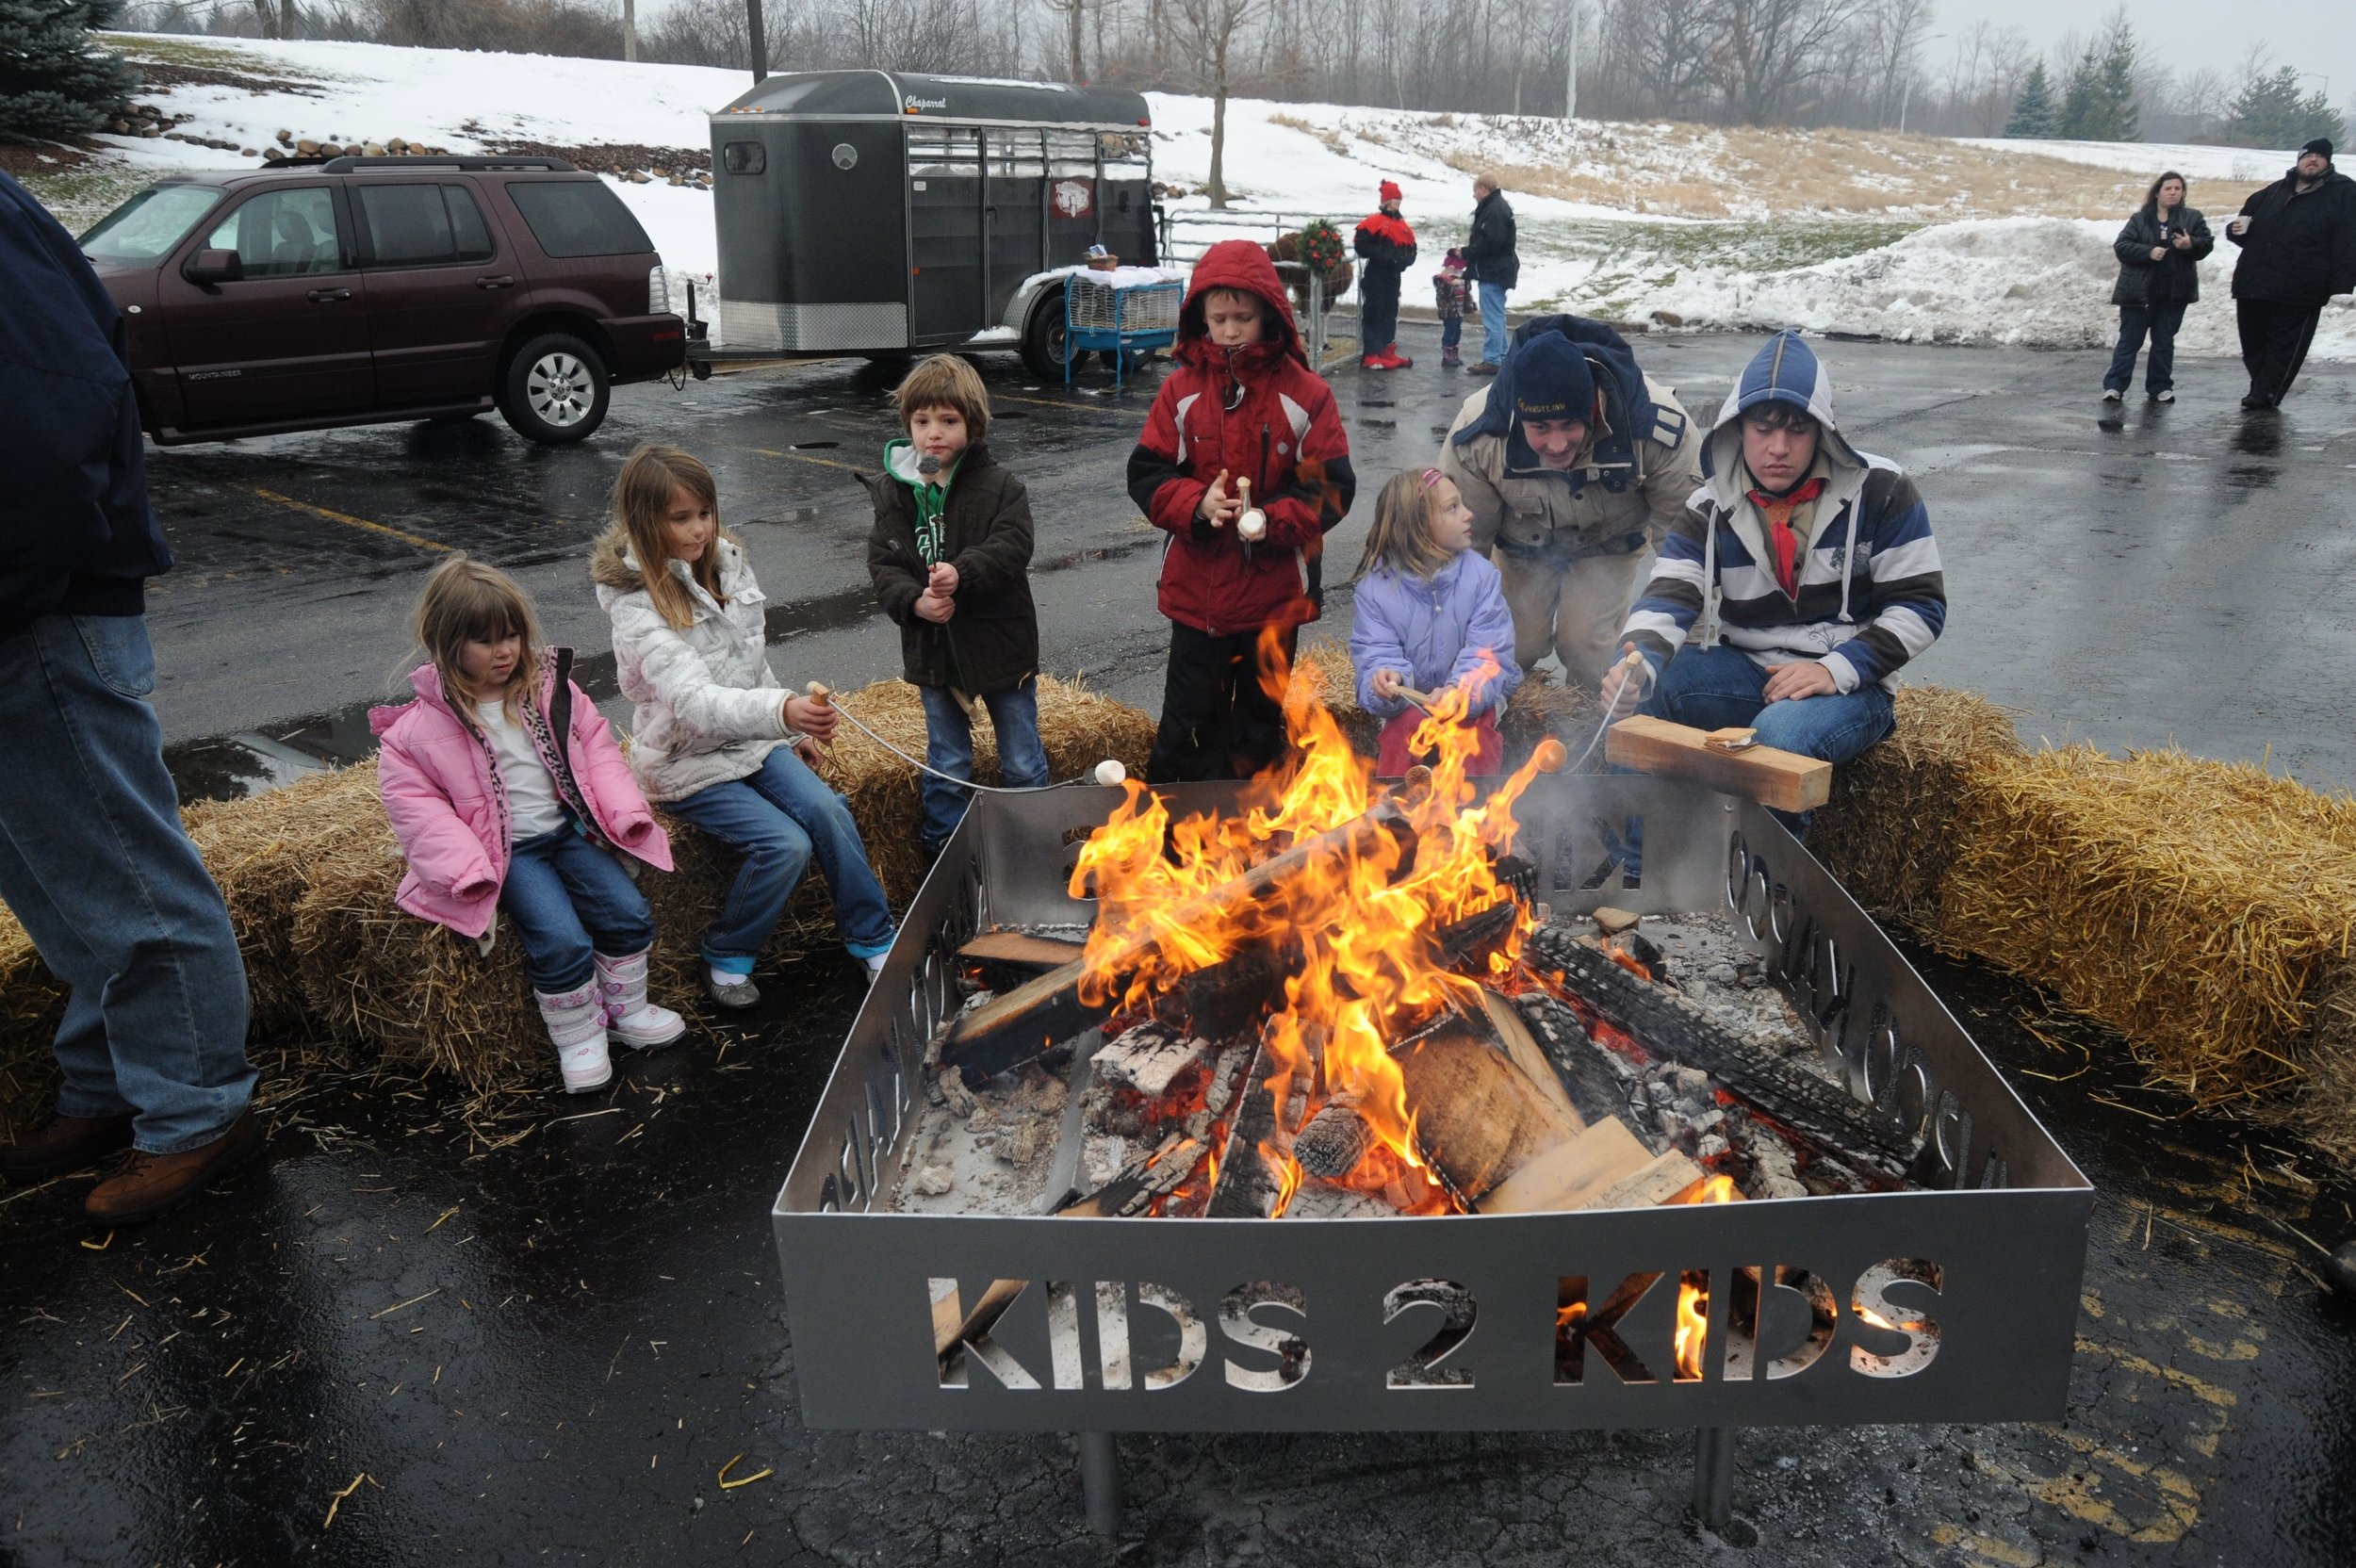 Kapco Metal Stamping - Kids 2 Kids Christmas Toy Drive -  (6).jpg